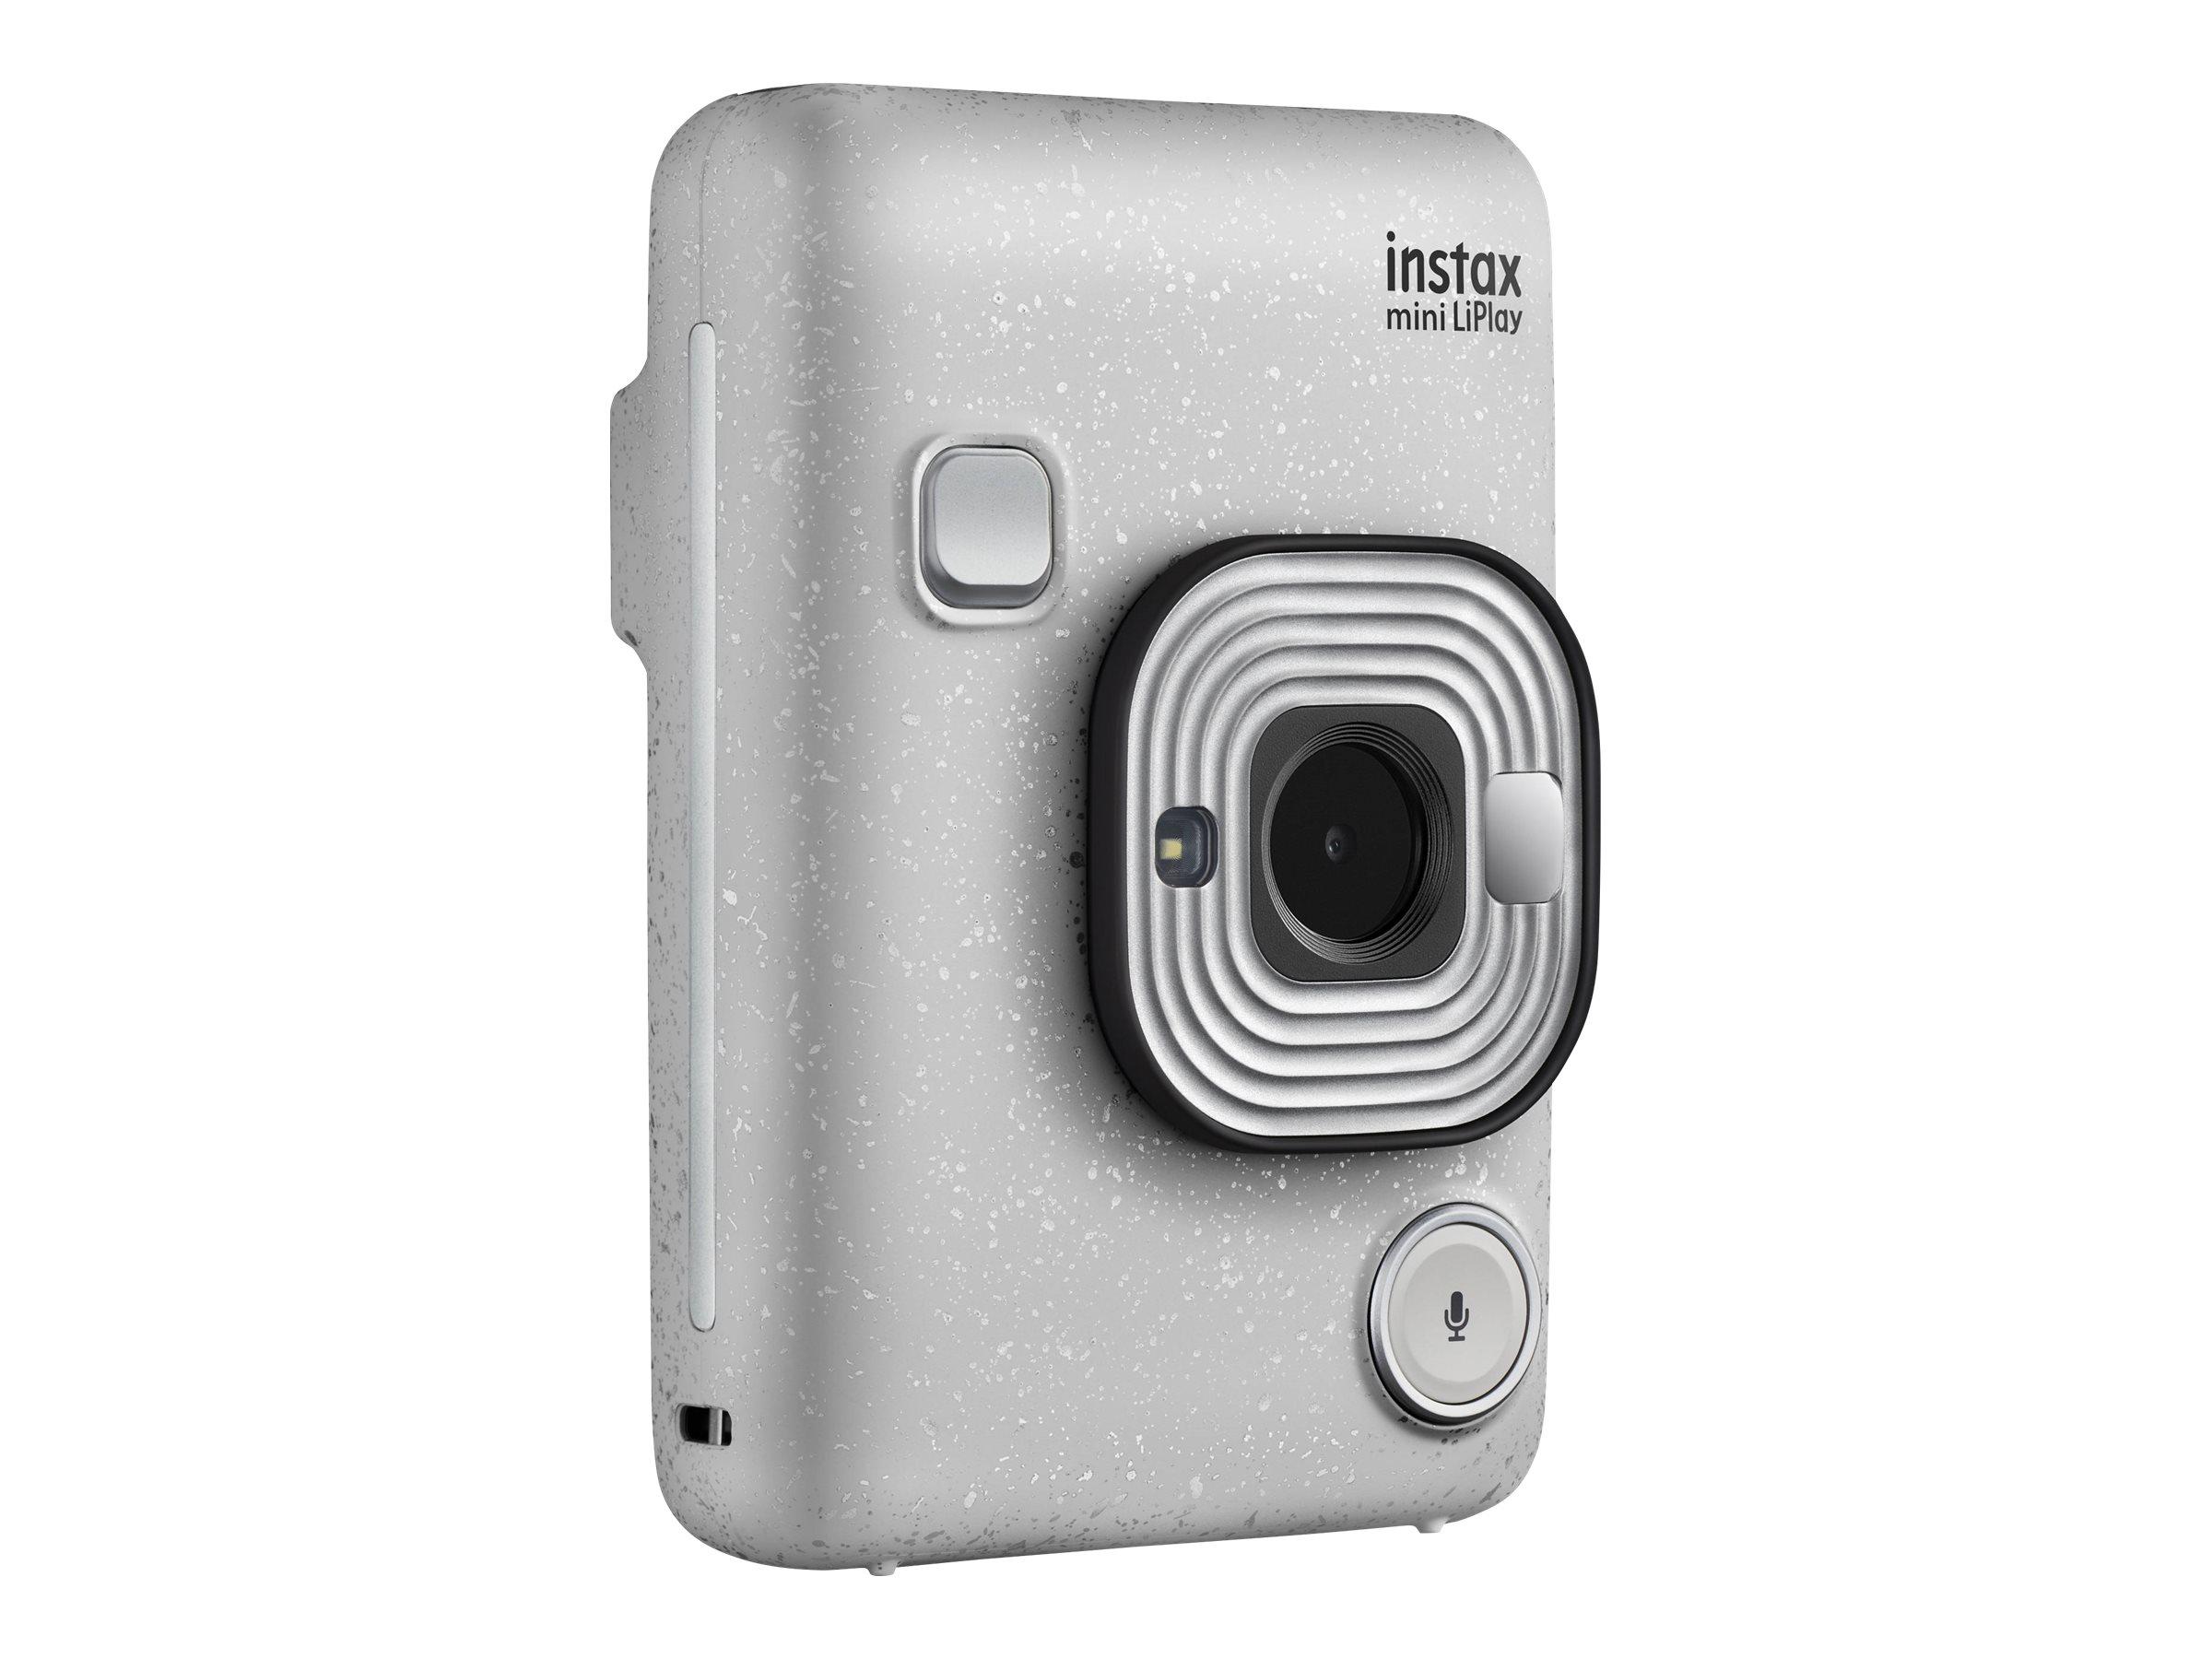 Fujifilm Instax Mini LiPlay - Digitalkamera - Kompaktkamera mit PhotoPrinter - Stone White